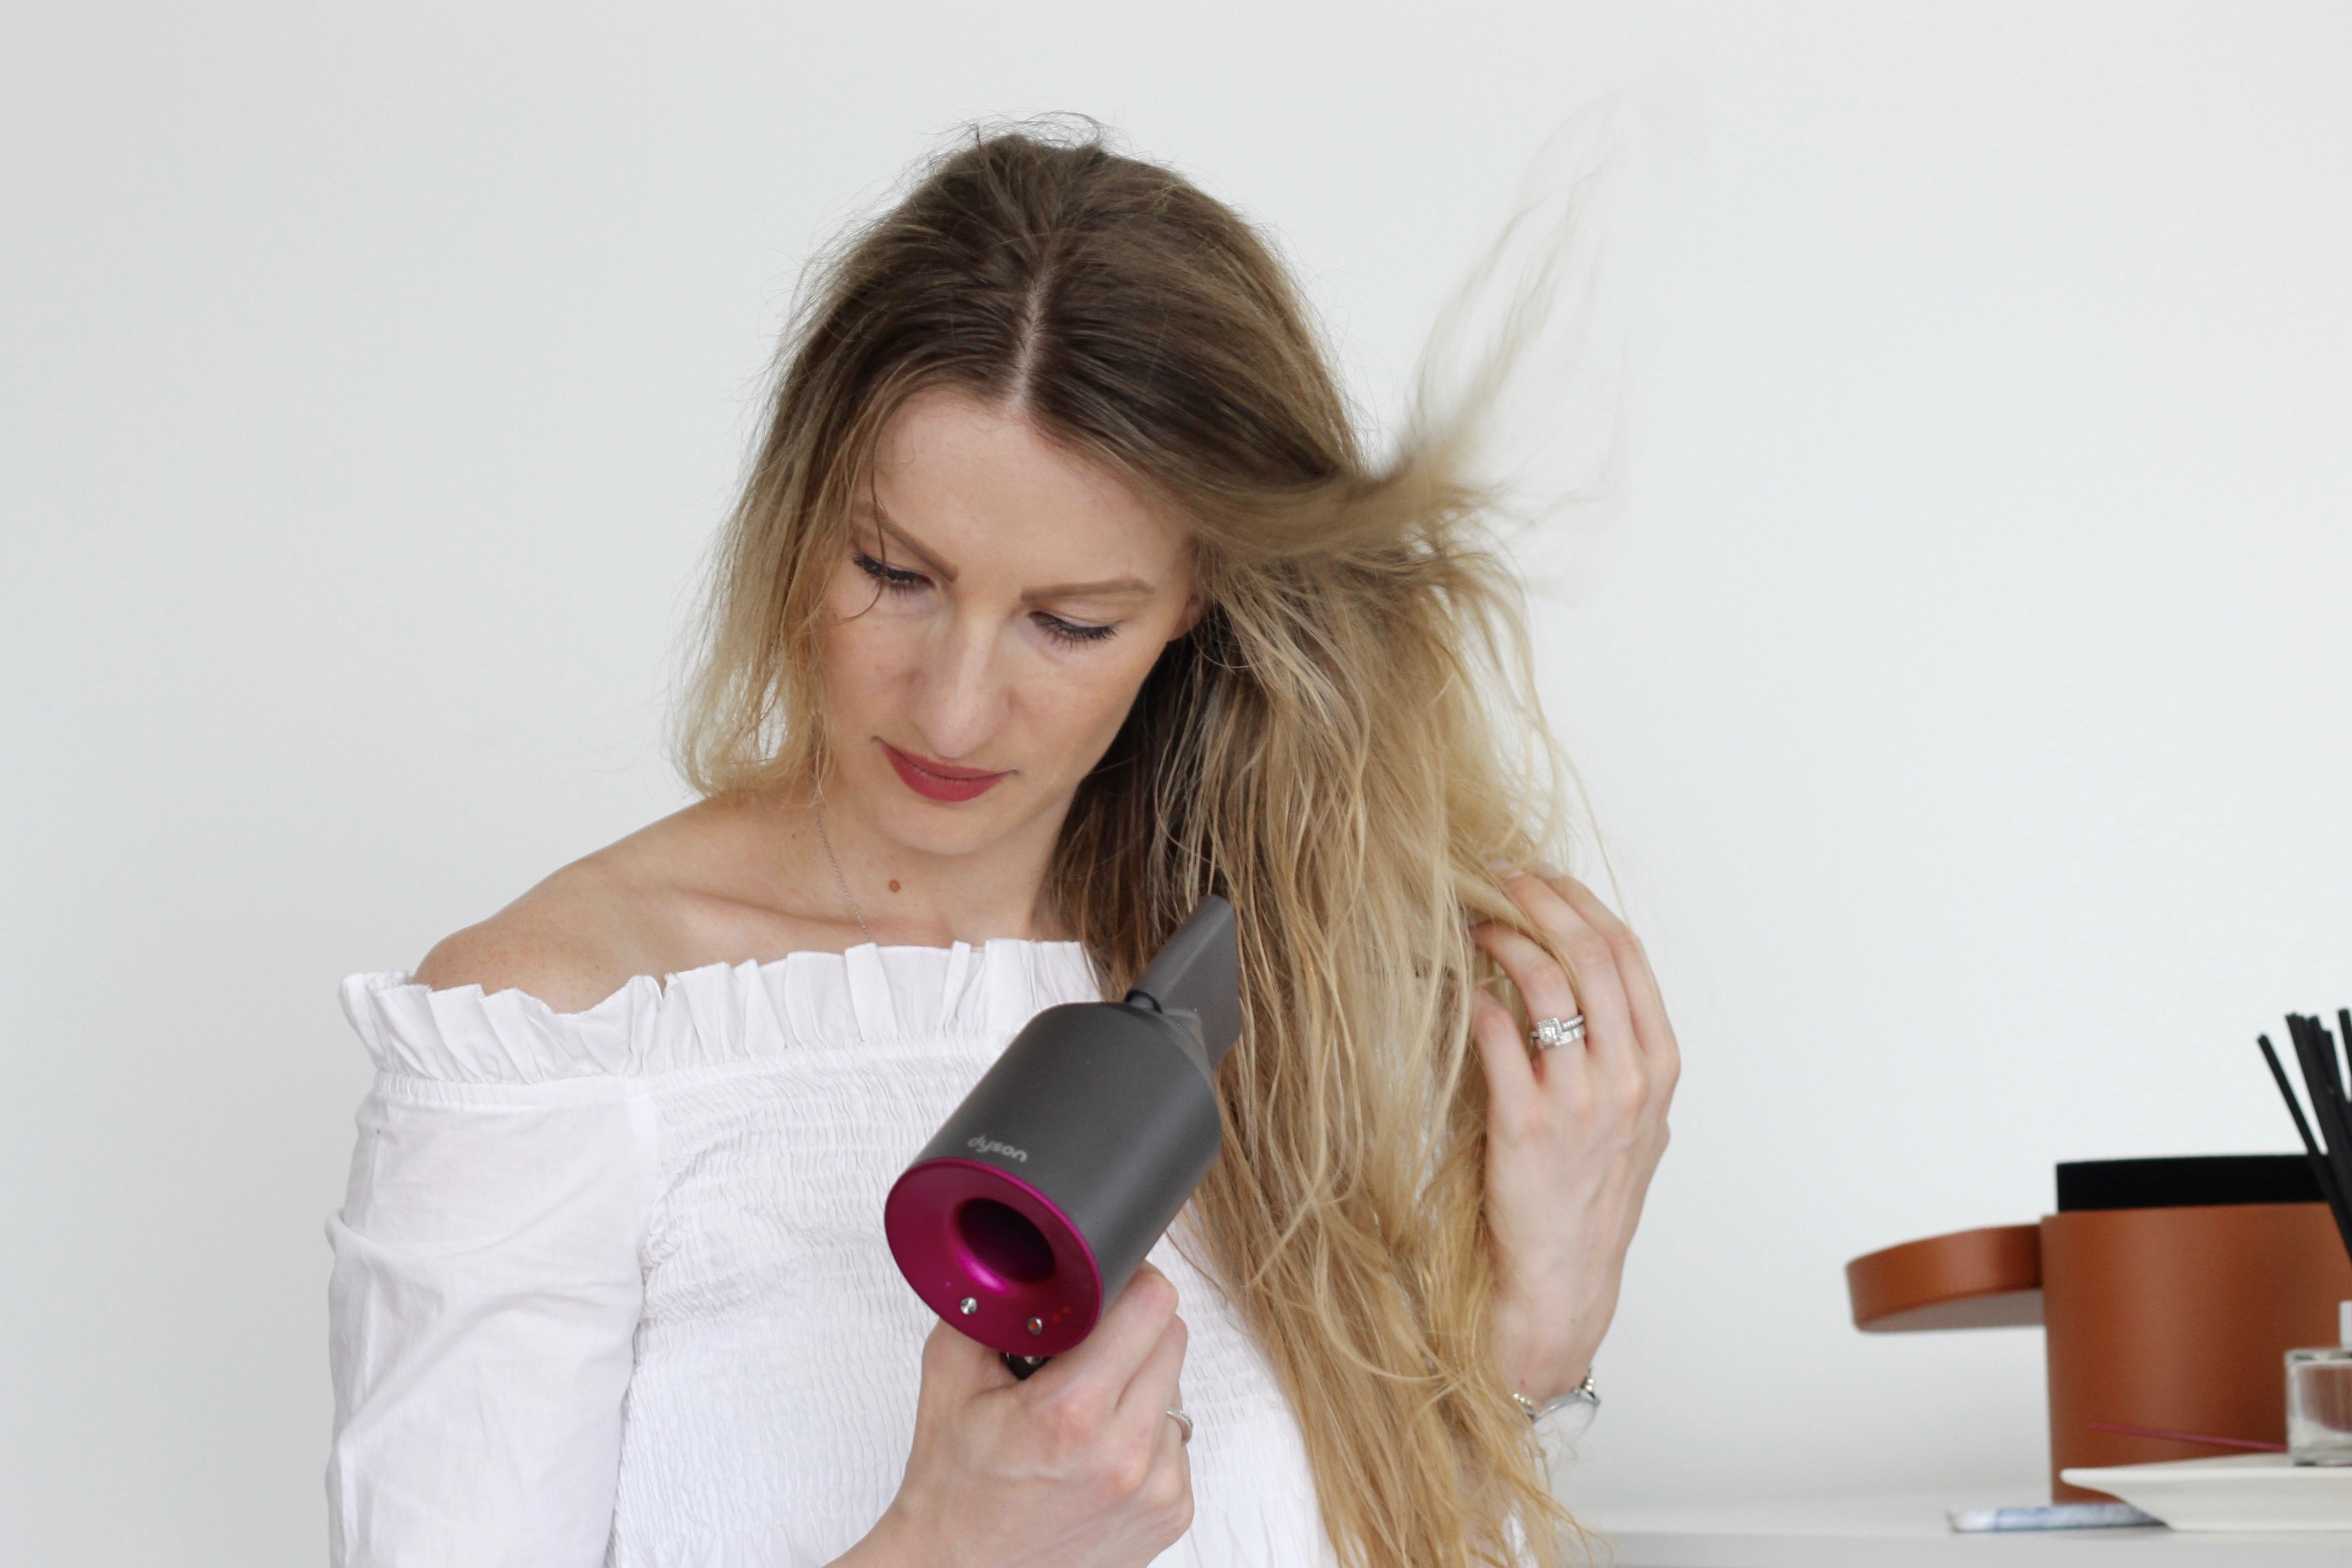 MON MODE Blog | Mon Mode | Fashion Blog | Toronto Blogger |Supersonic | Dyson Hair | Beach Waves